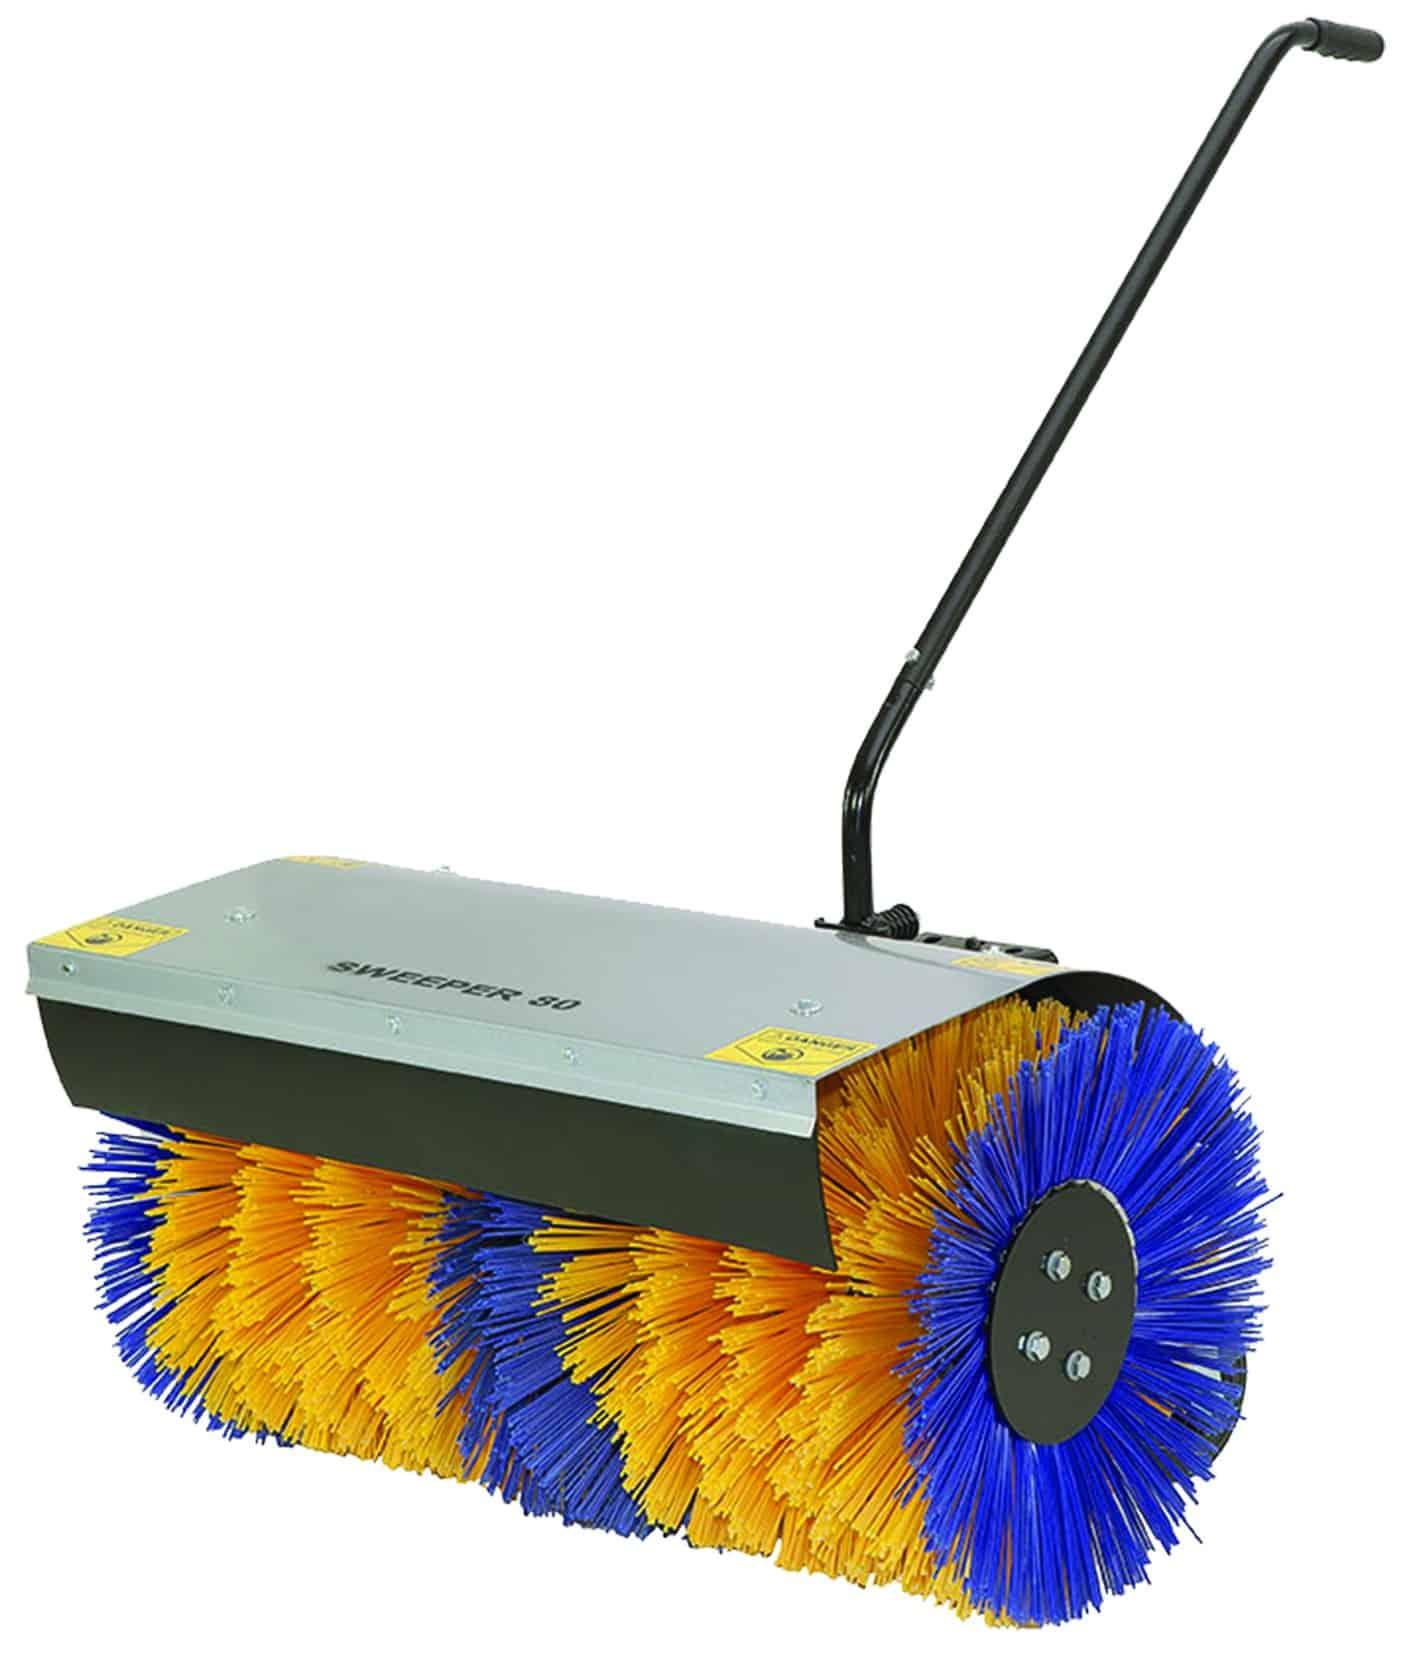 Camon BCS Power Brush